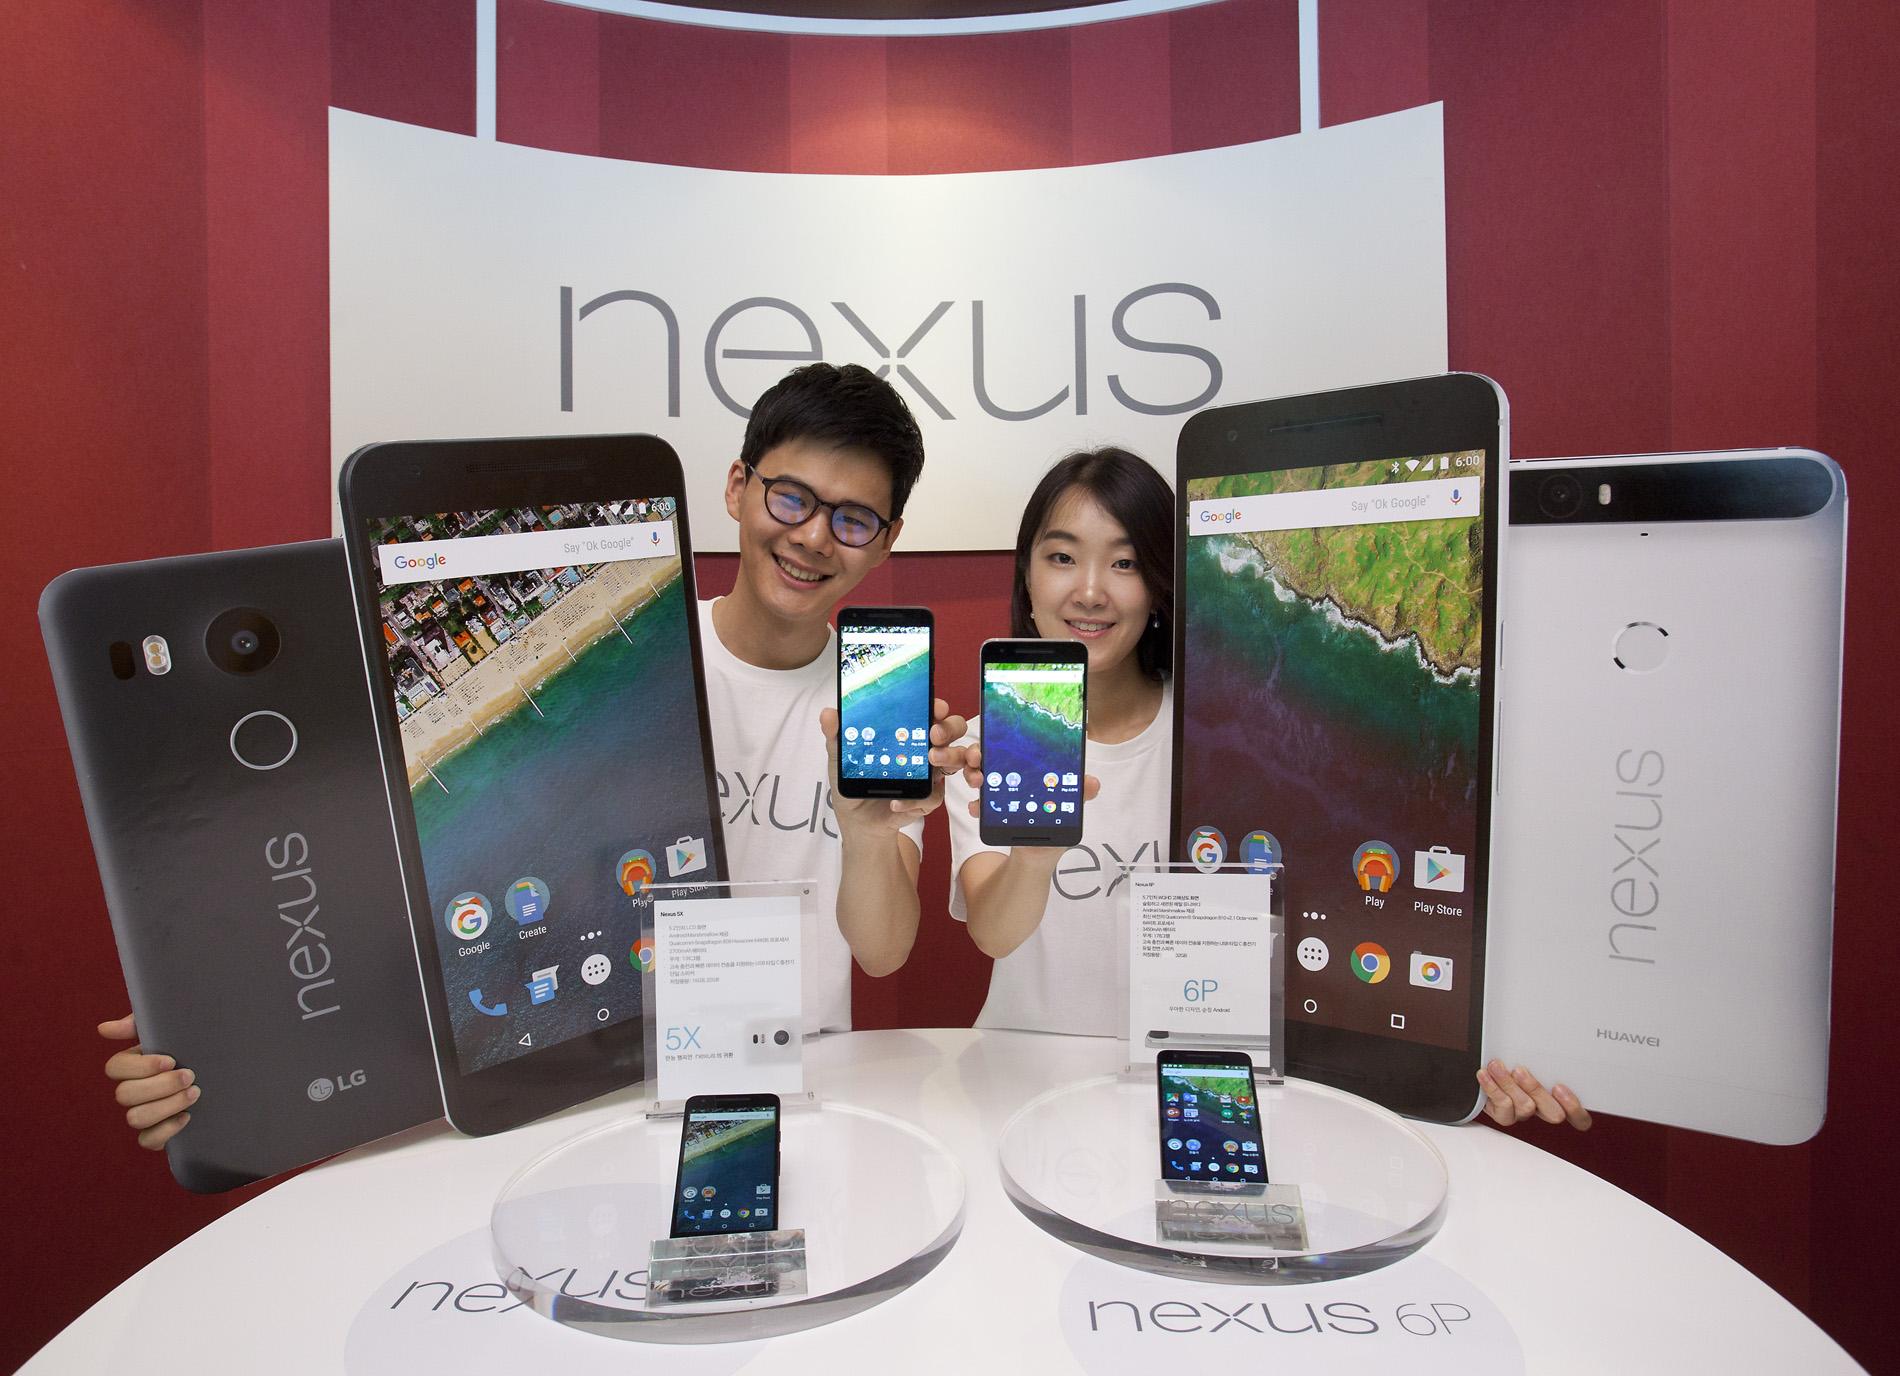 Google unveils new Nexus phones in Seoul | The Korea Times